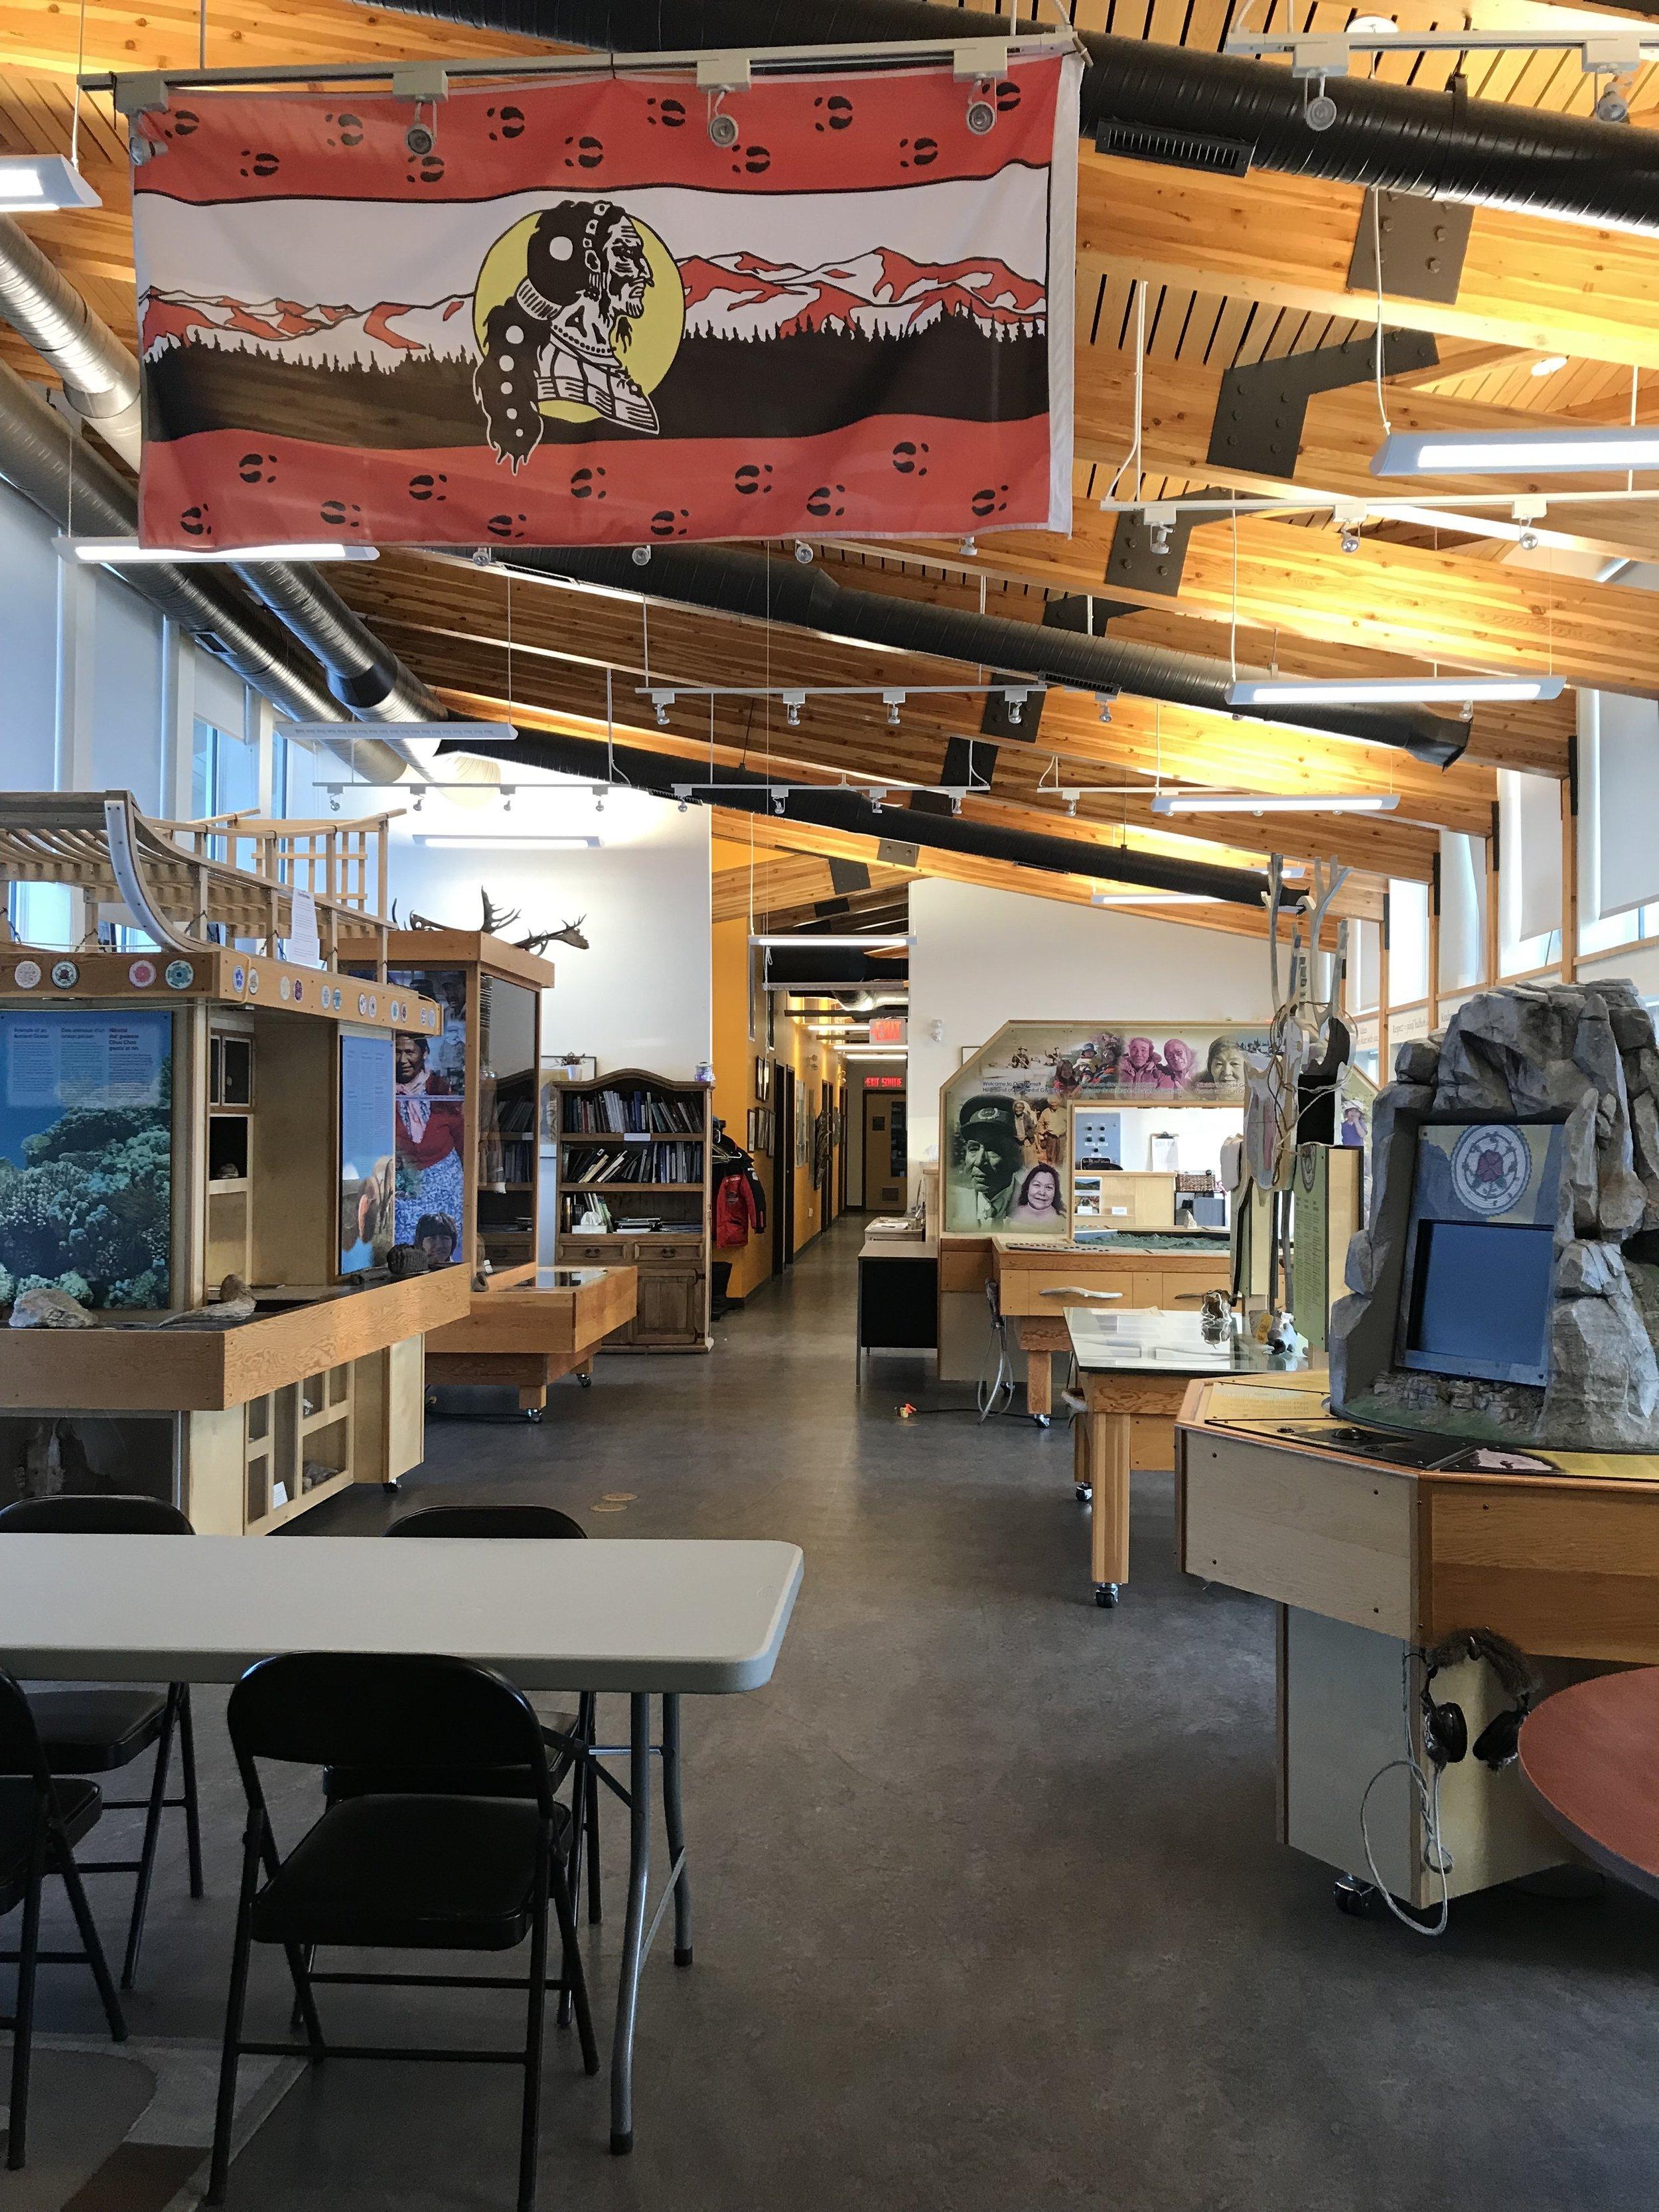 The John Tyzia Centre's interactive exhibits